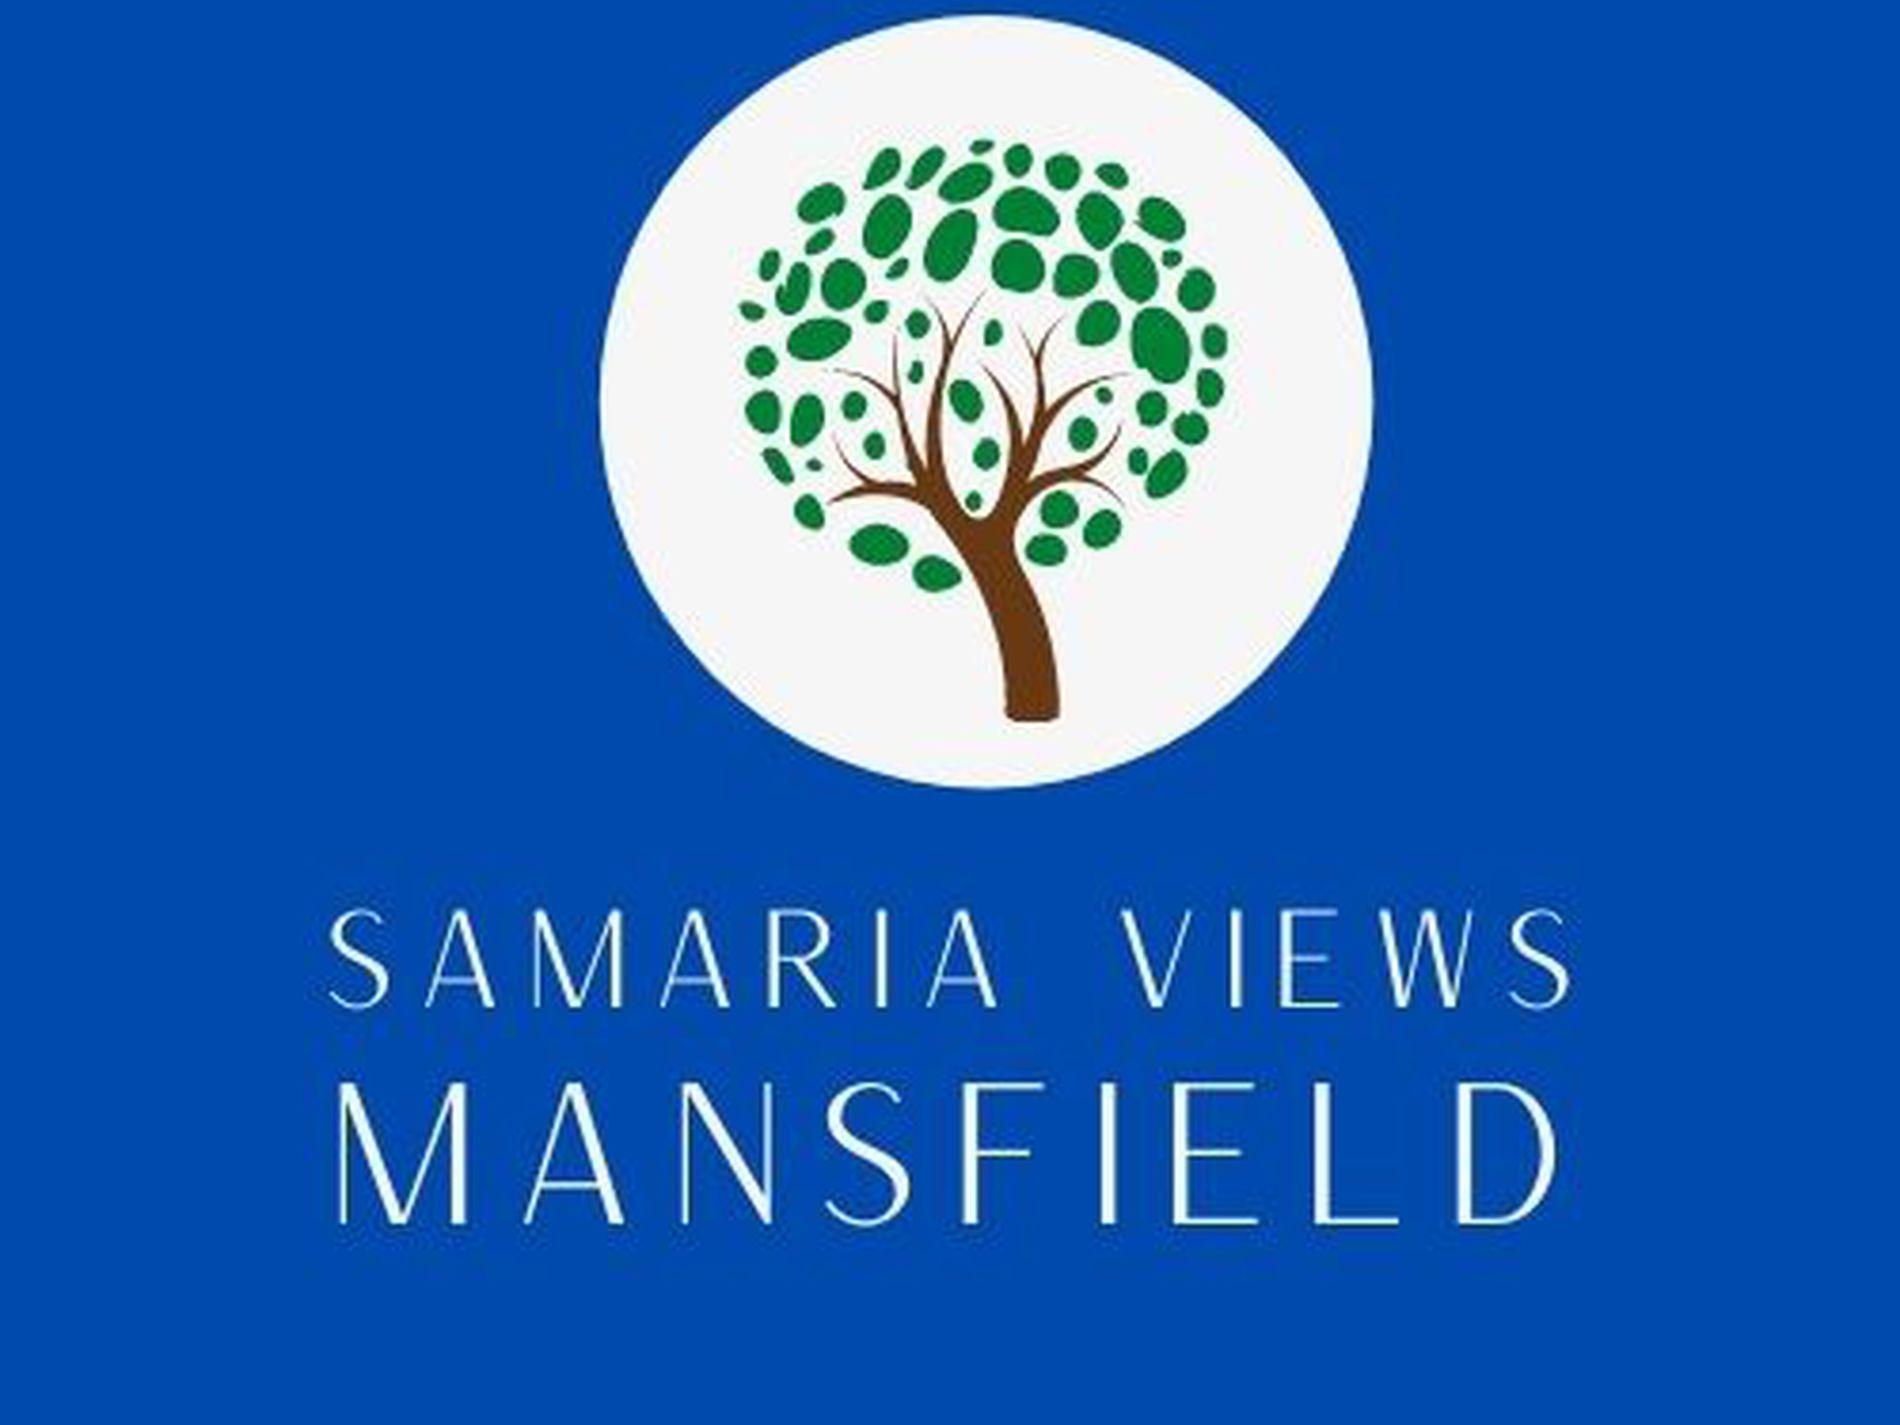 Lot 110, Samaria Views, Mansfield